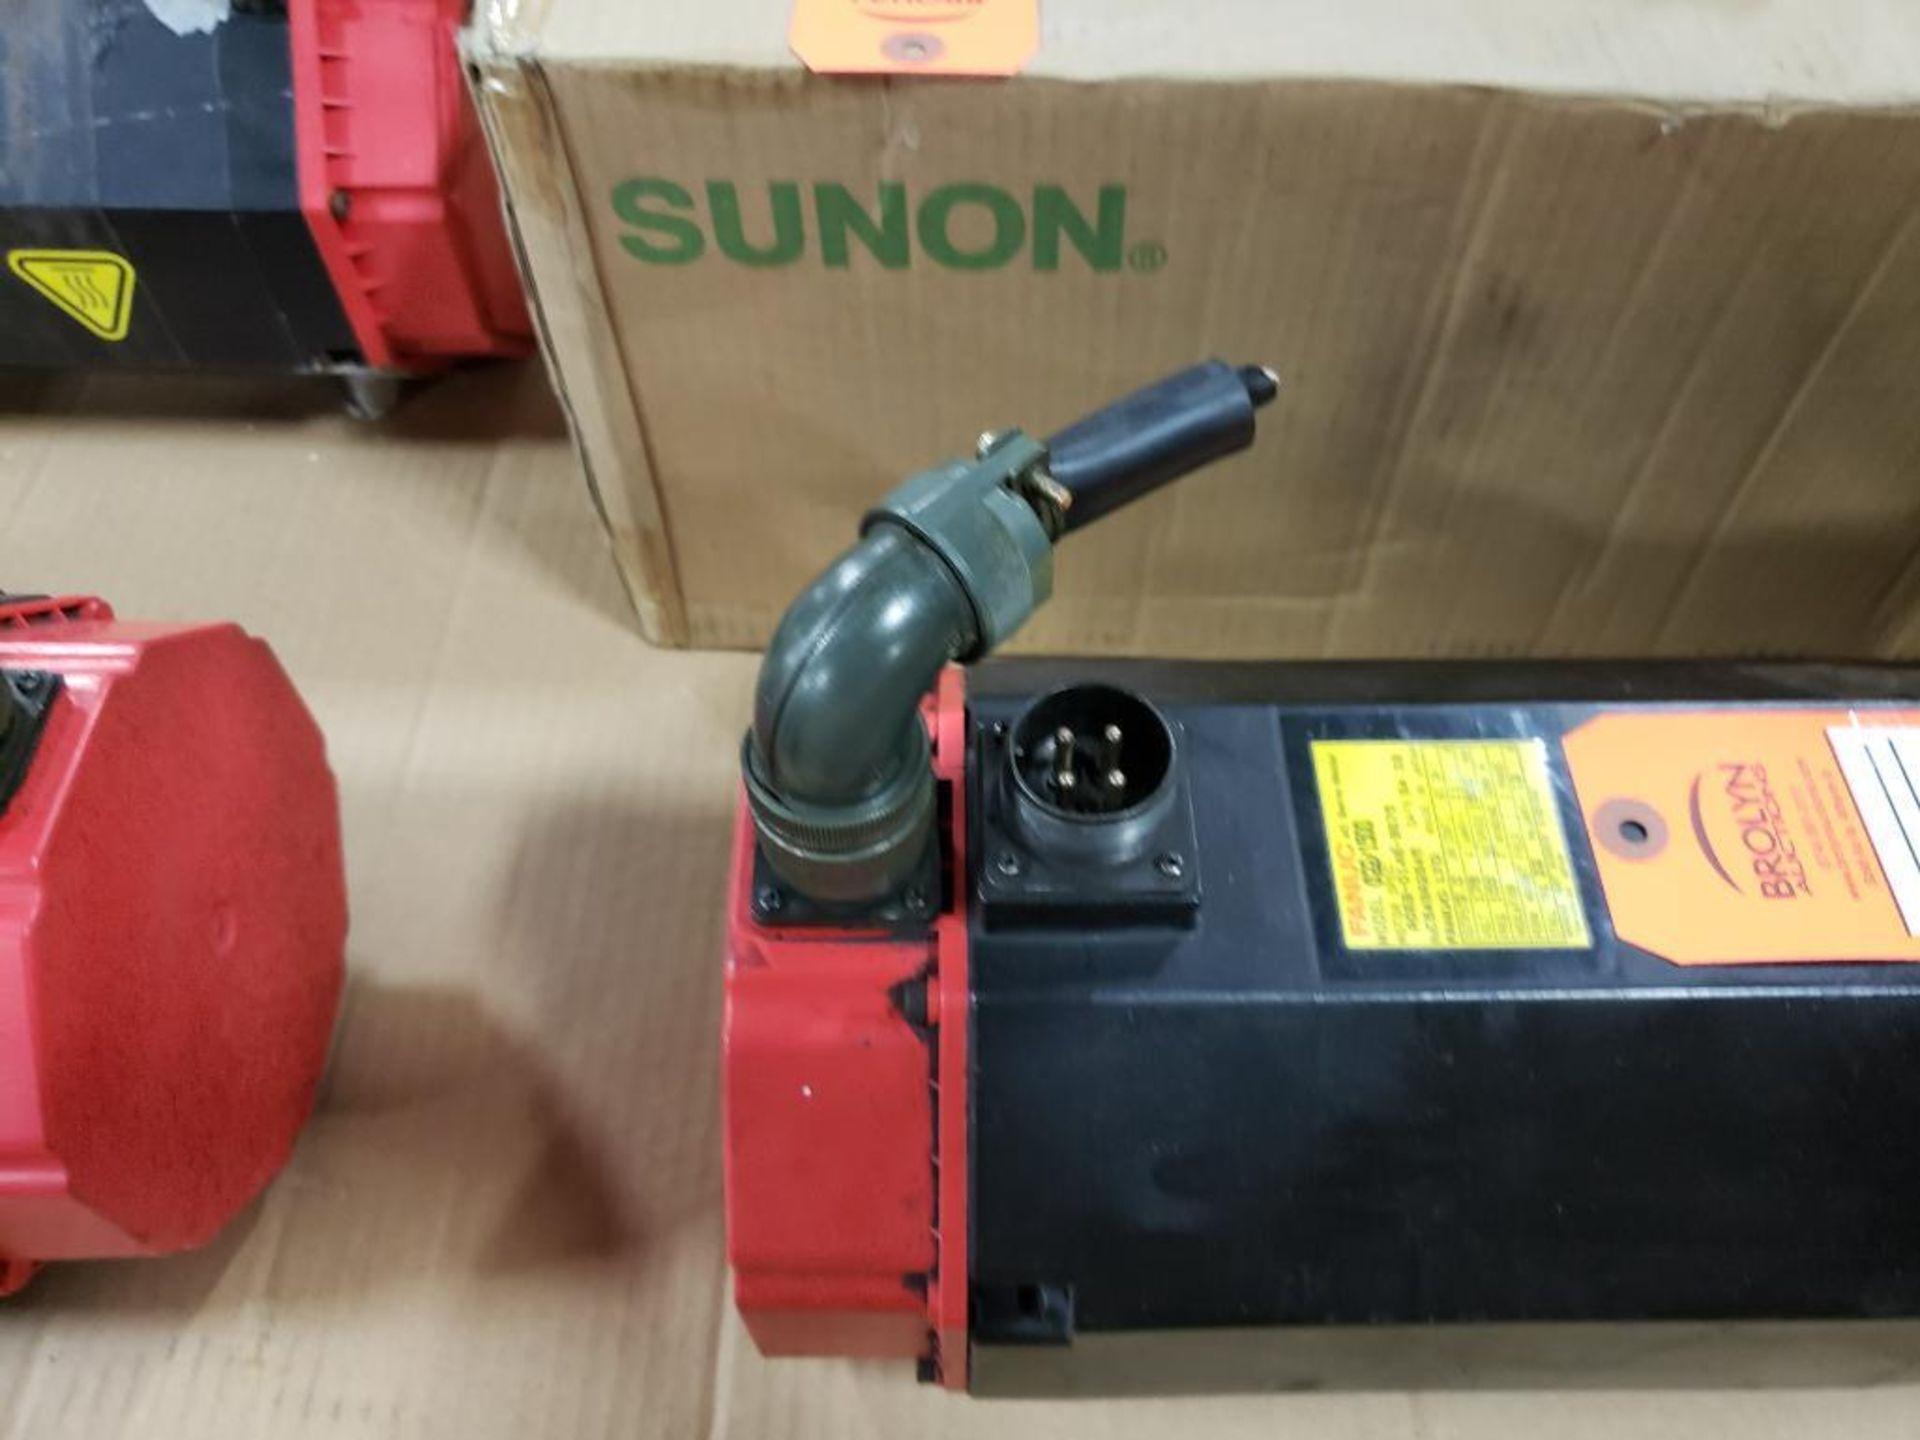 3.0kW GE Fanuc AC Servo Motor A06B-0146-B675. 179V, 1500RPM, 3PH. - Image 3 of 6